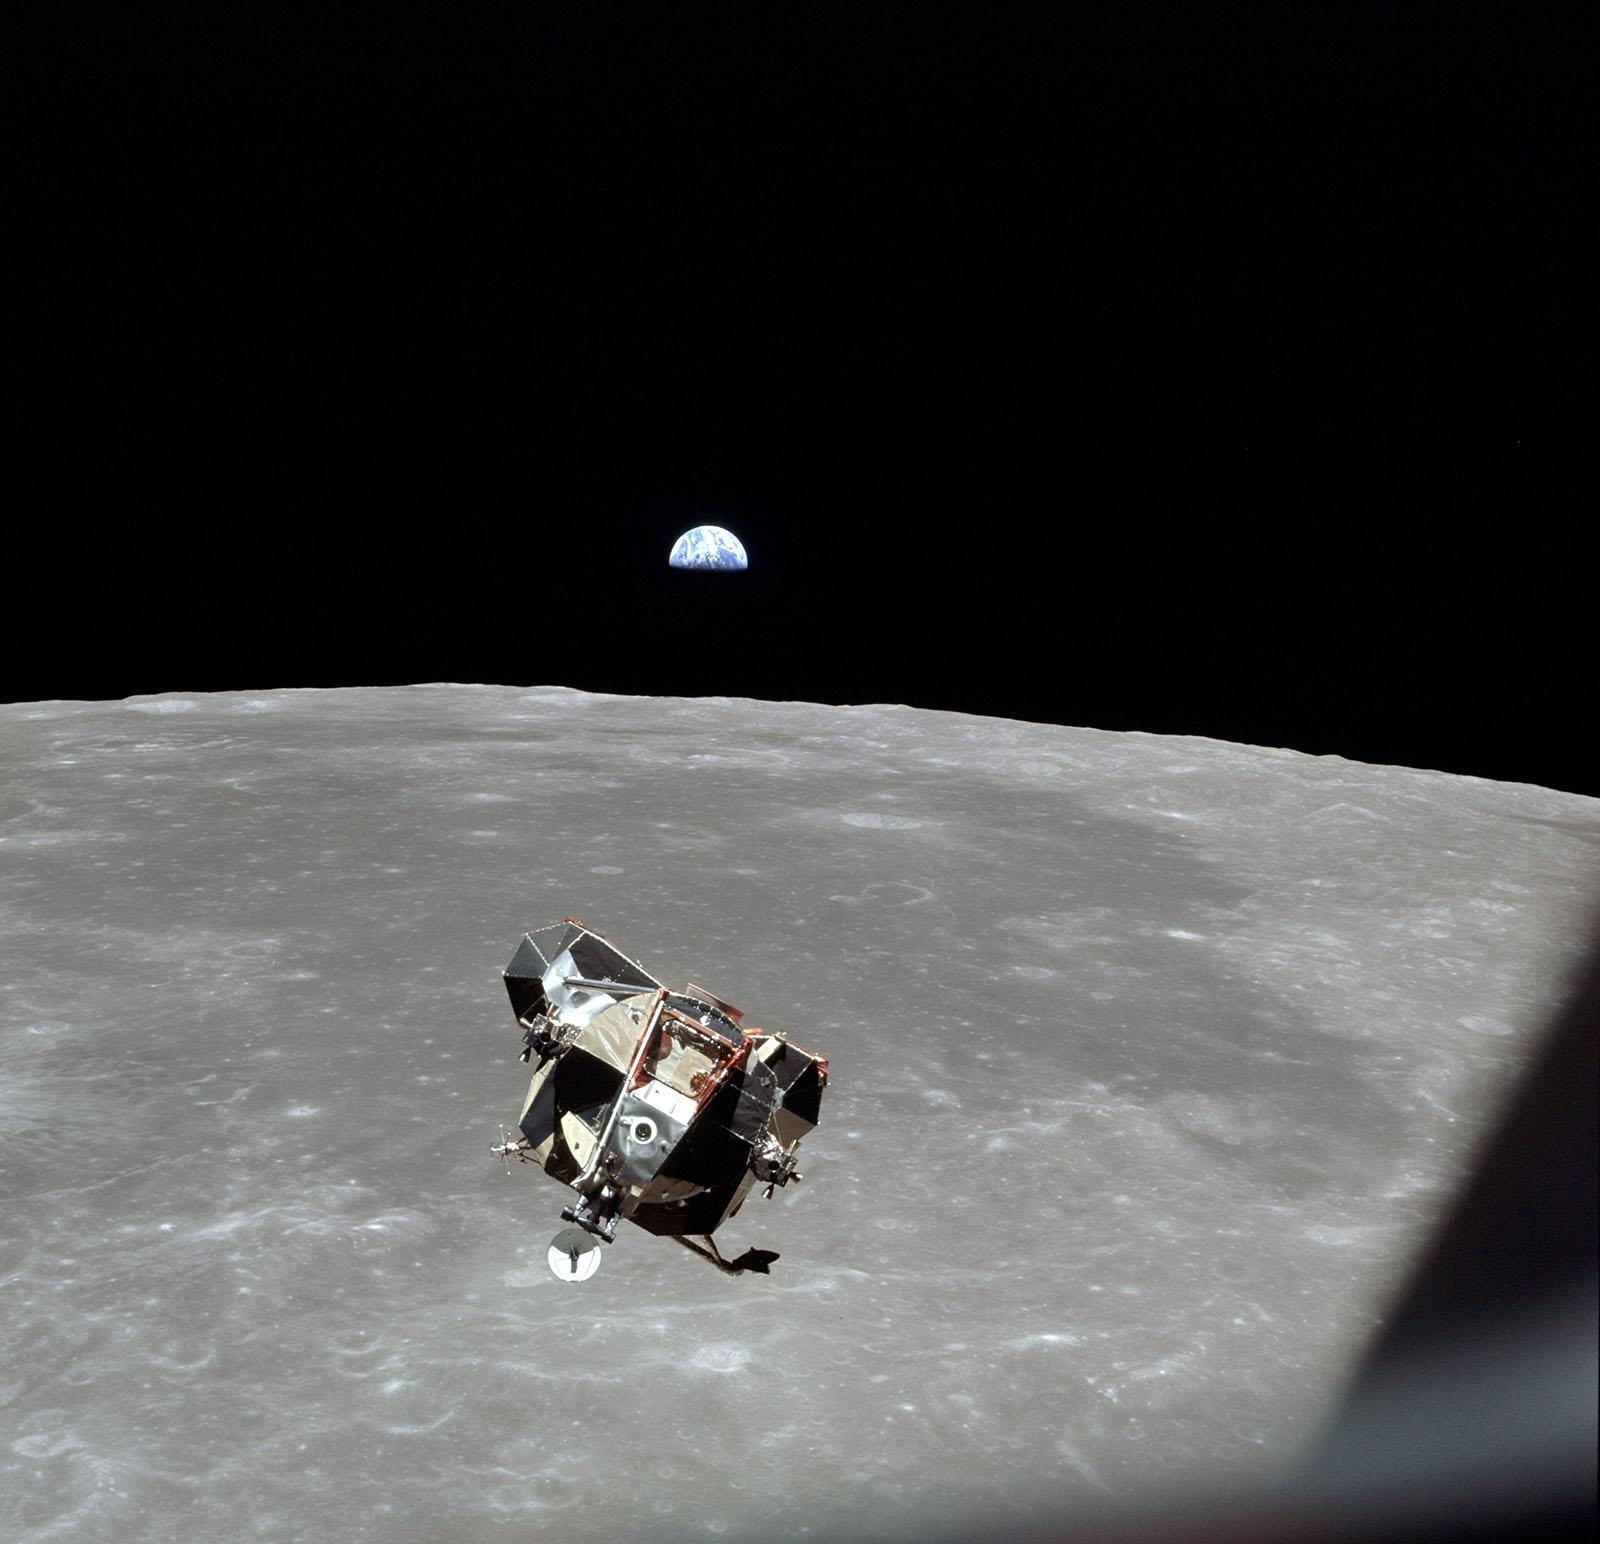 My Apollo 11 Experience